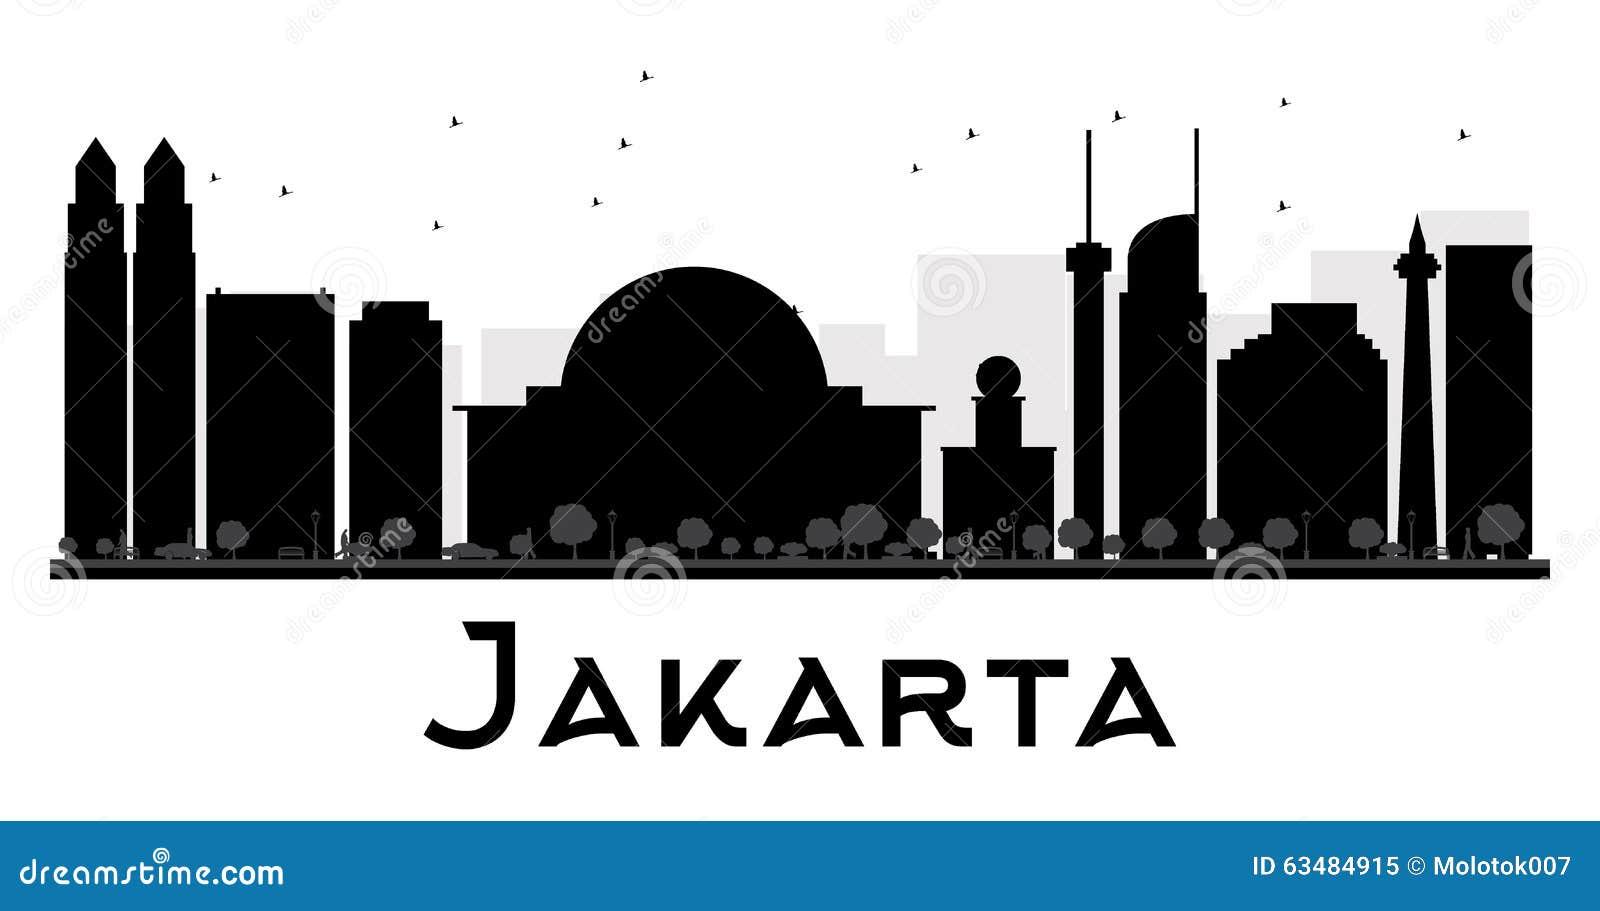 Jakarta City Skyline Black And White Silhouette